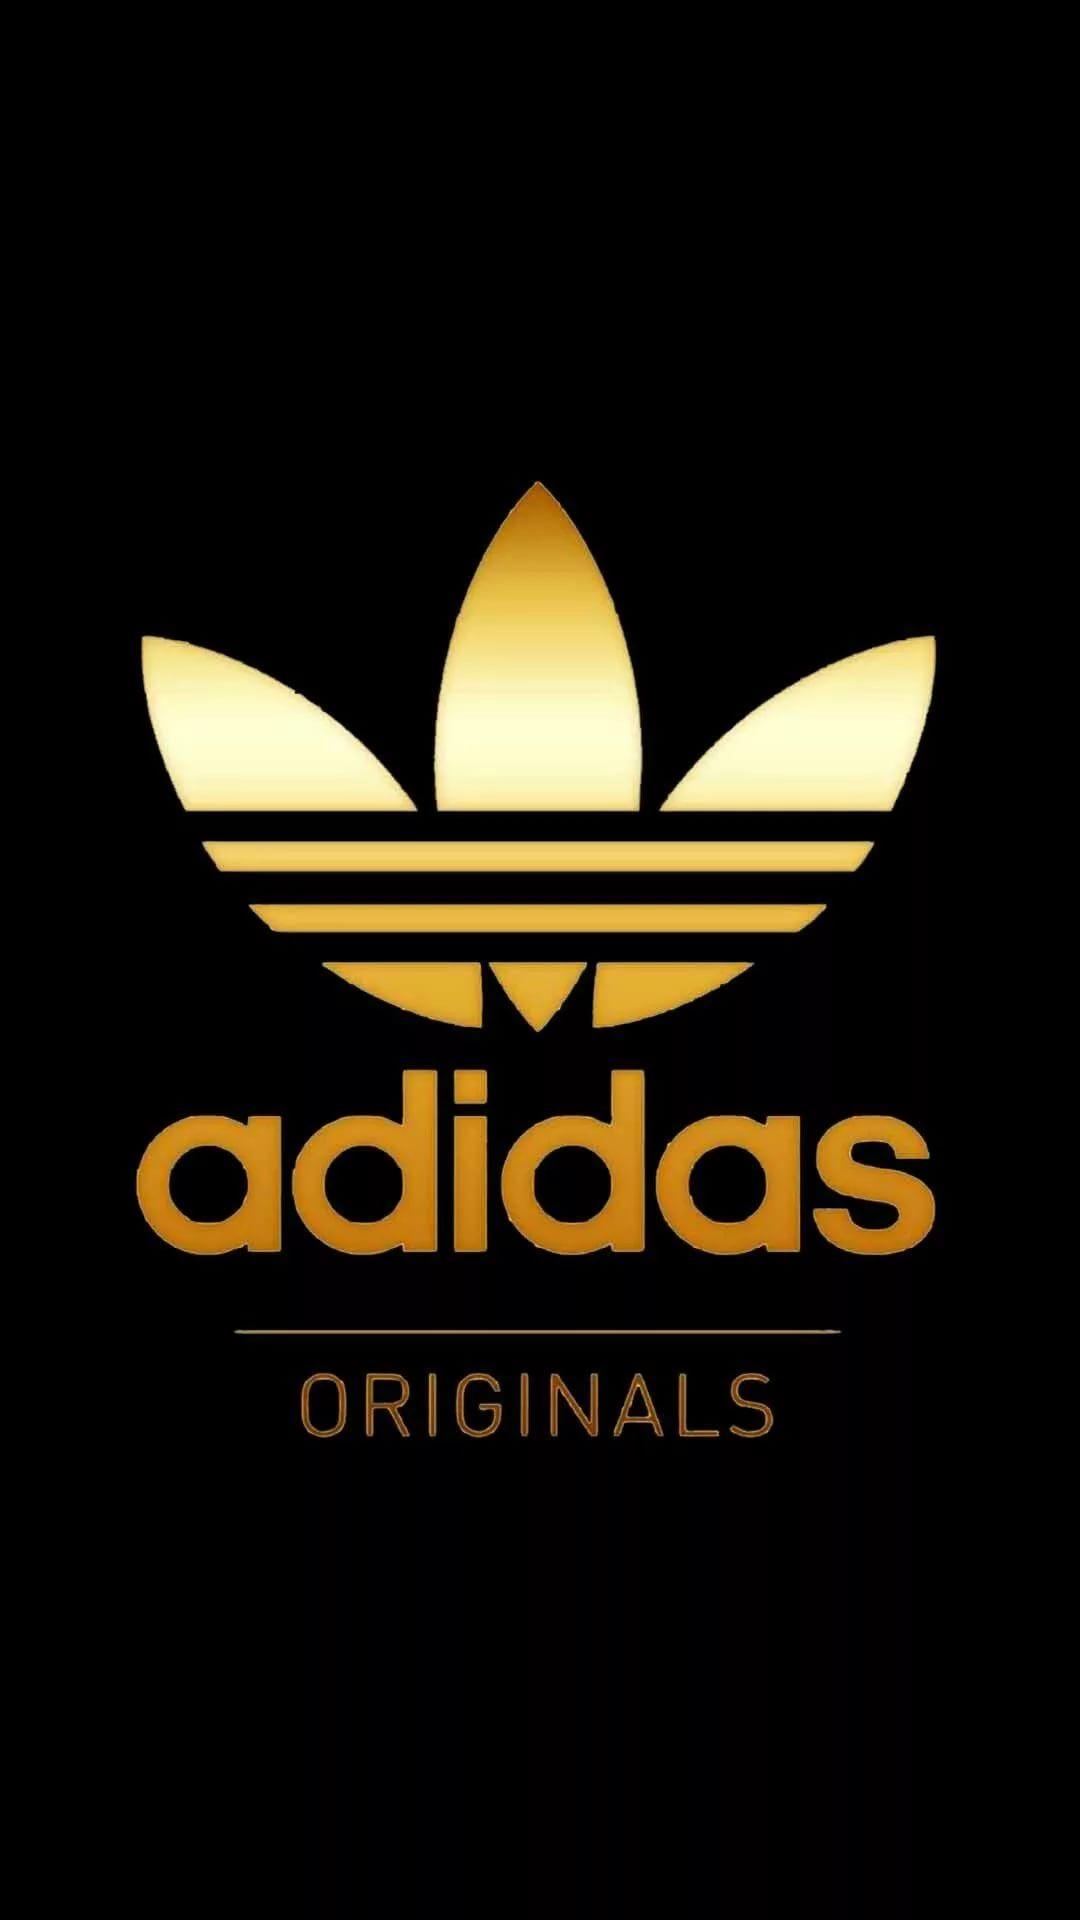 Adidas iPhone 6 wallpaper